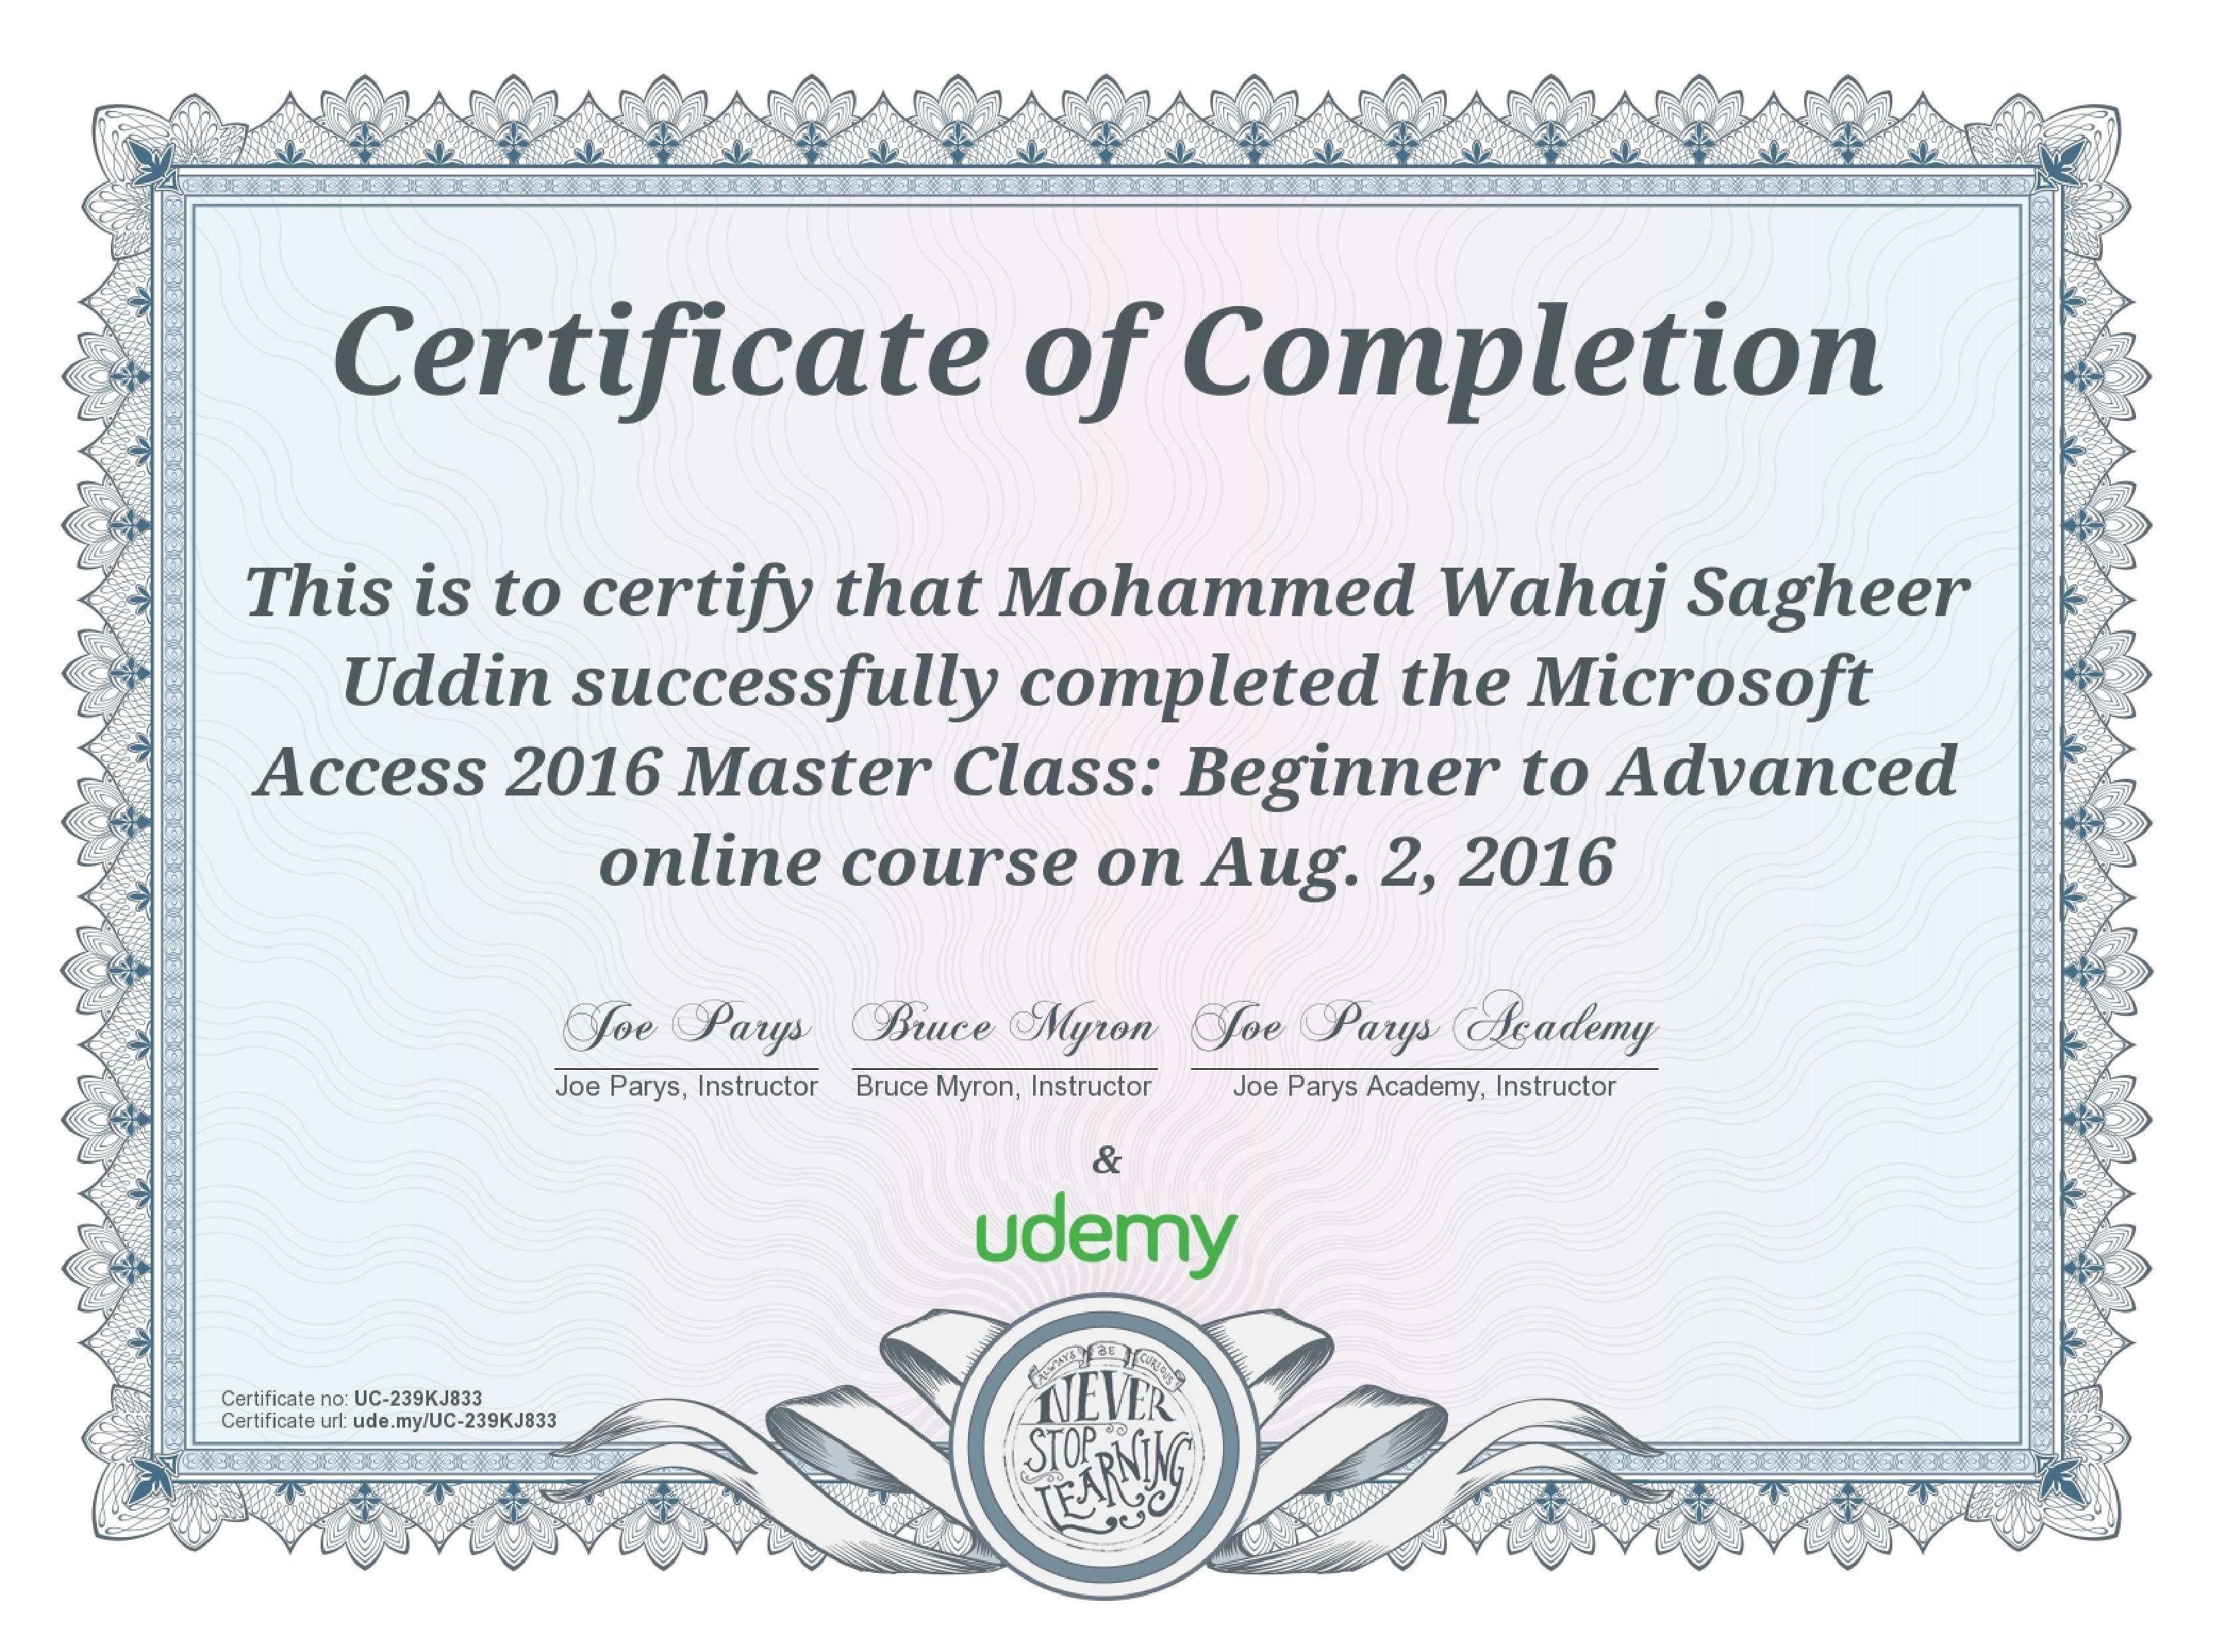 Mohammed wahaj sagheer uddin bayt microsoft access 2016 master class certificate 1betcityfo Image collections